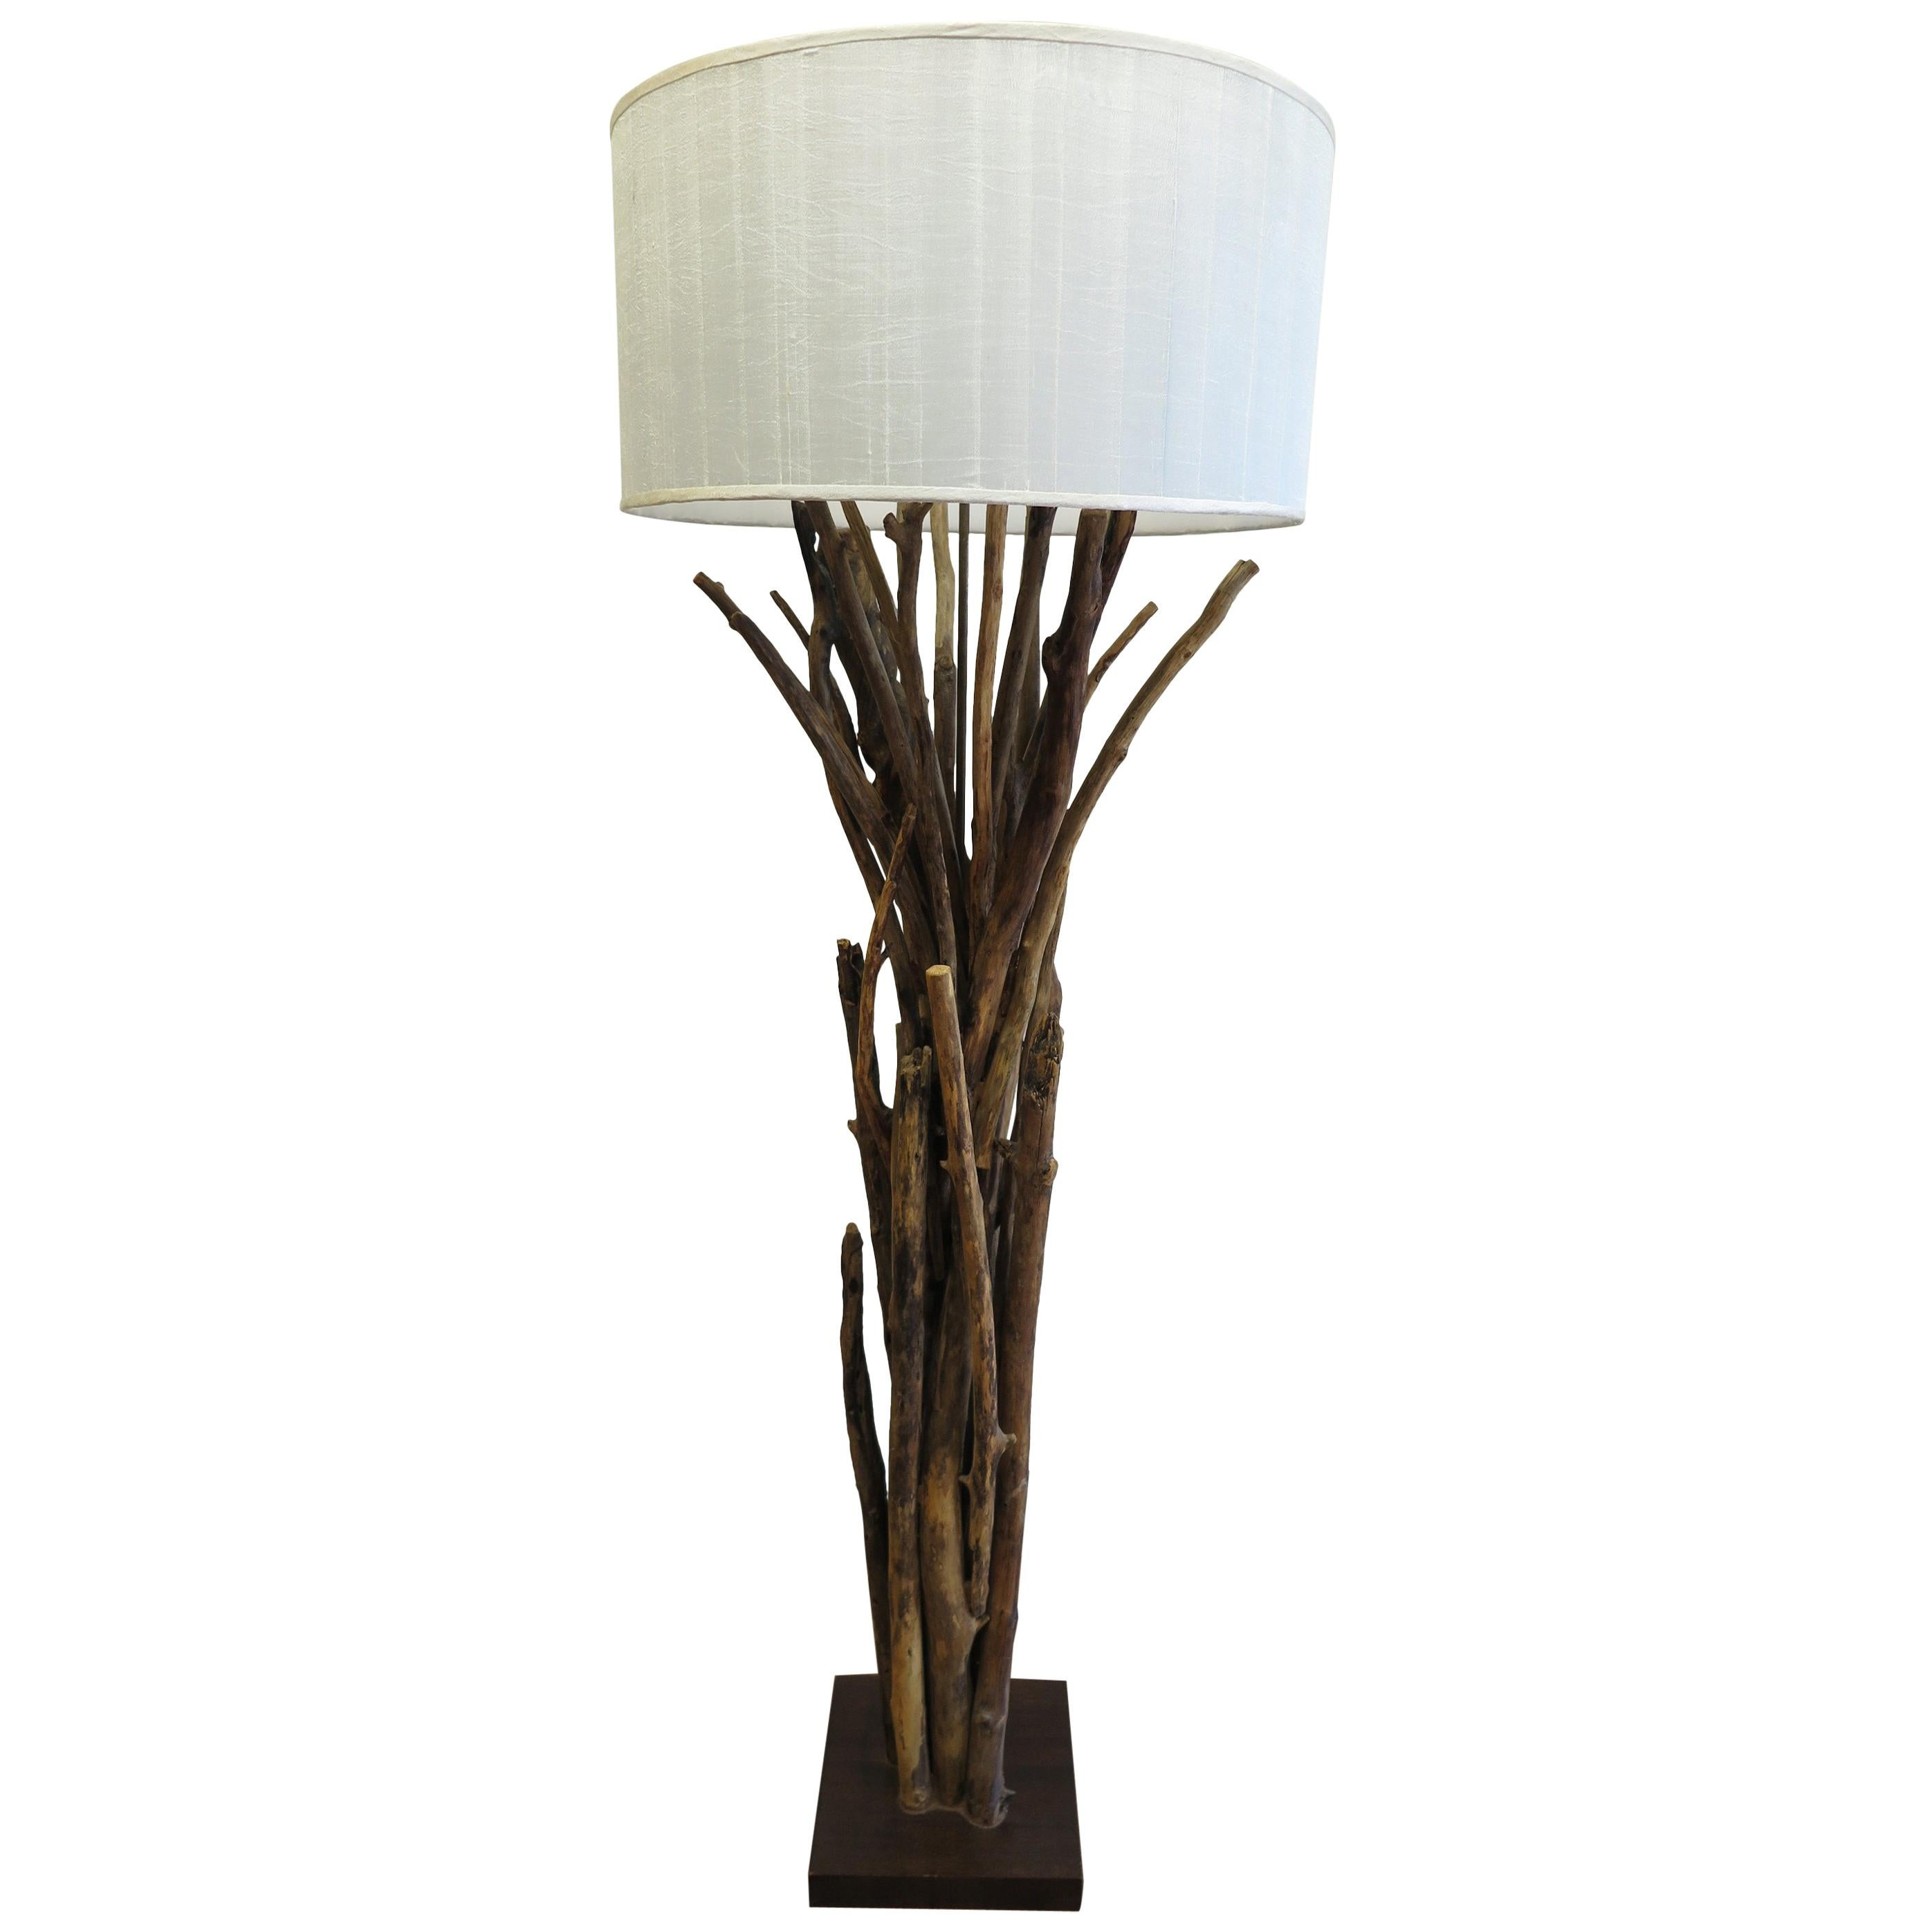 Natural Twig Driftwood Floor Lamp